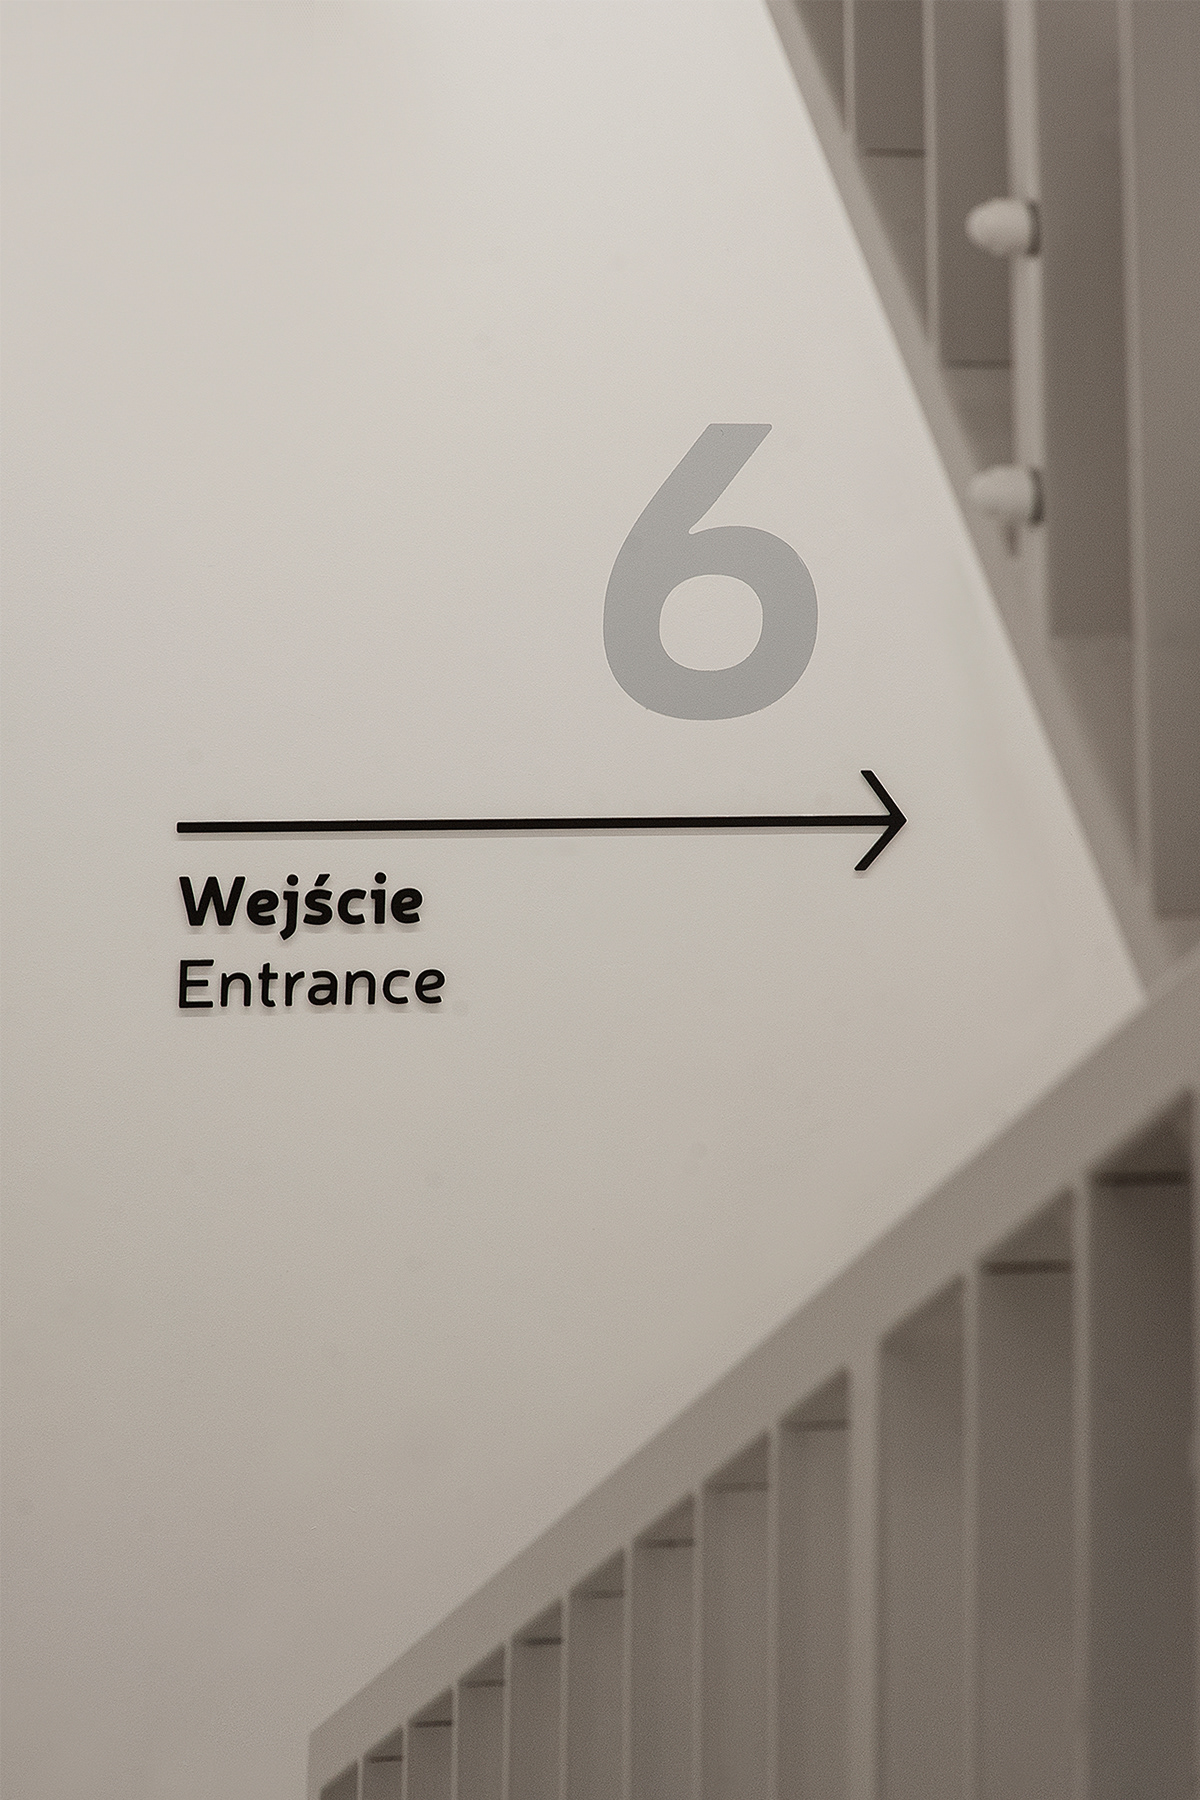 wayfinding Signage wayfinding system environmental design sign pictogram icons Visual Information information architecture  wayshowing